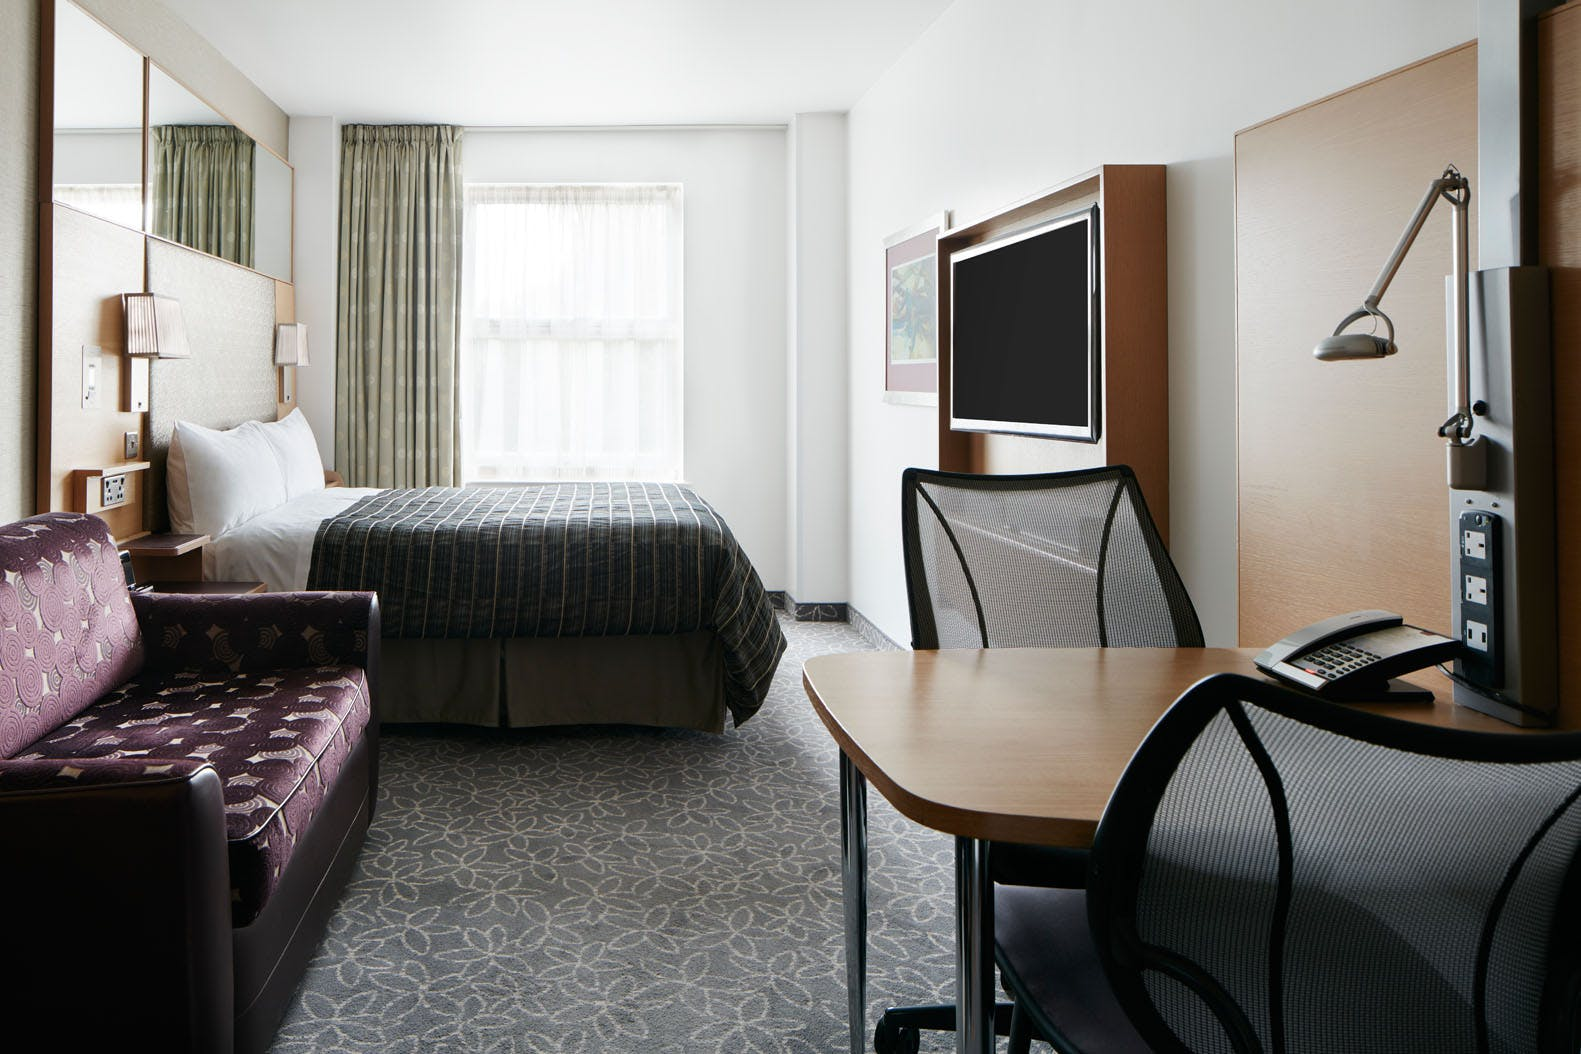 Superior Room at Club Quarters Hotel, Lincoln's Inn Fields